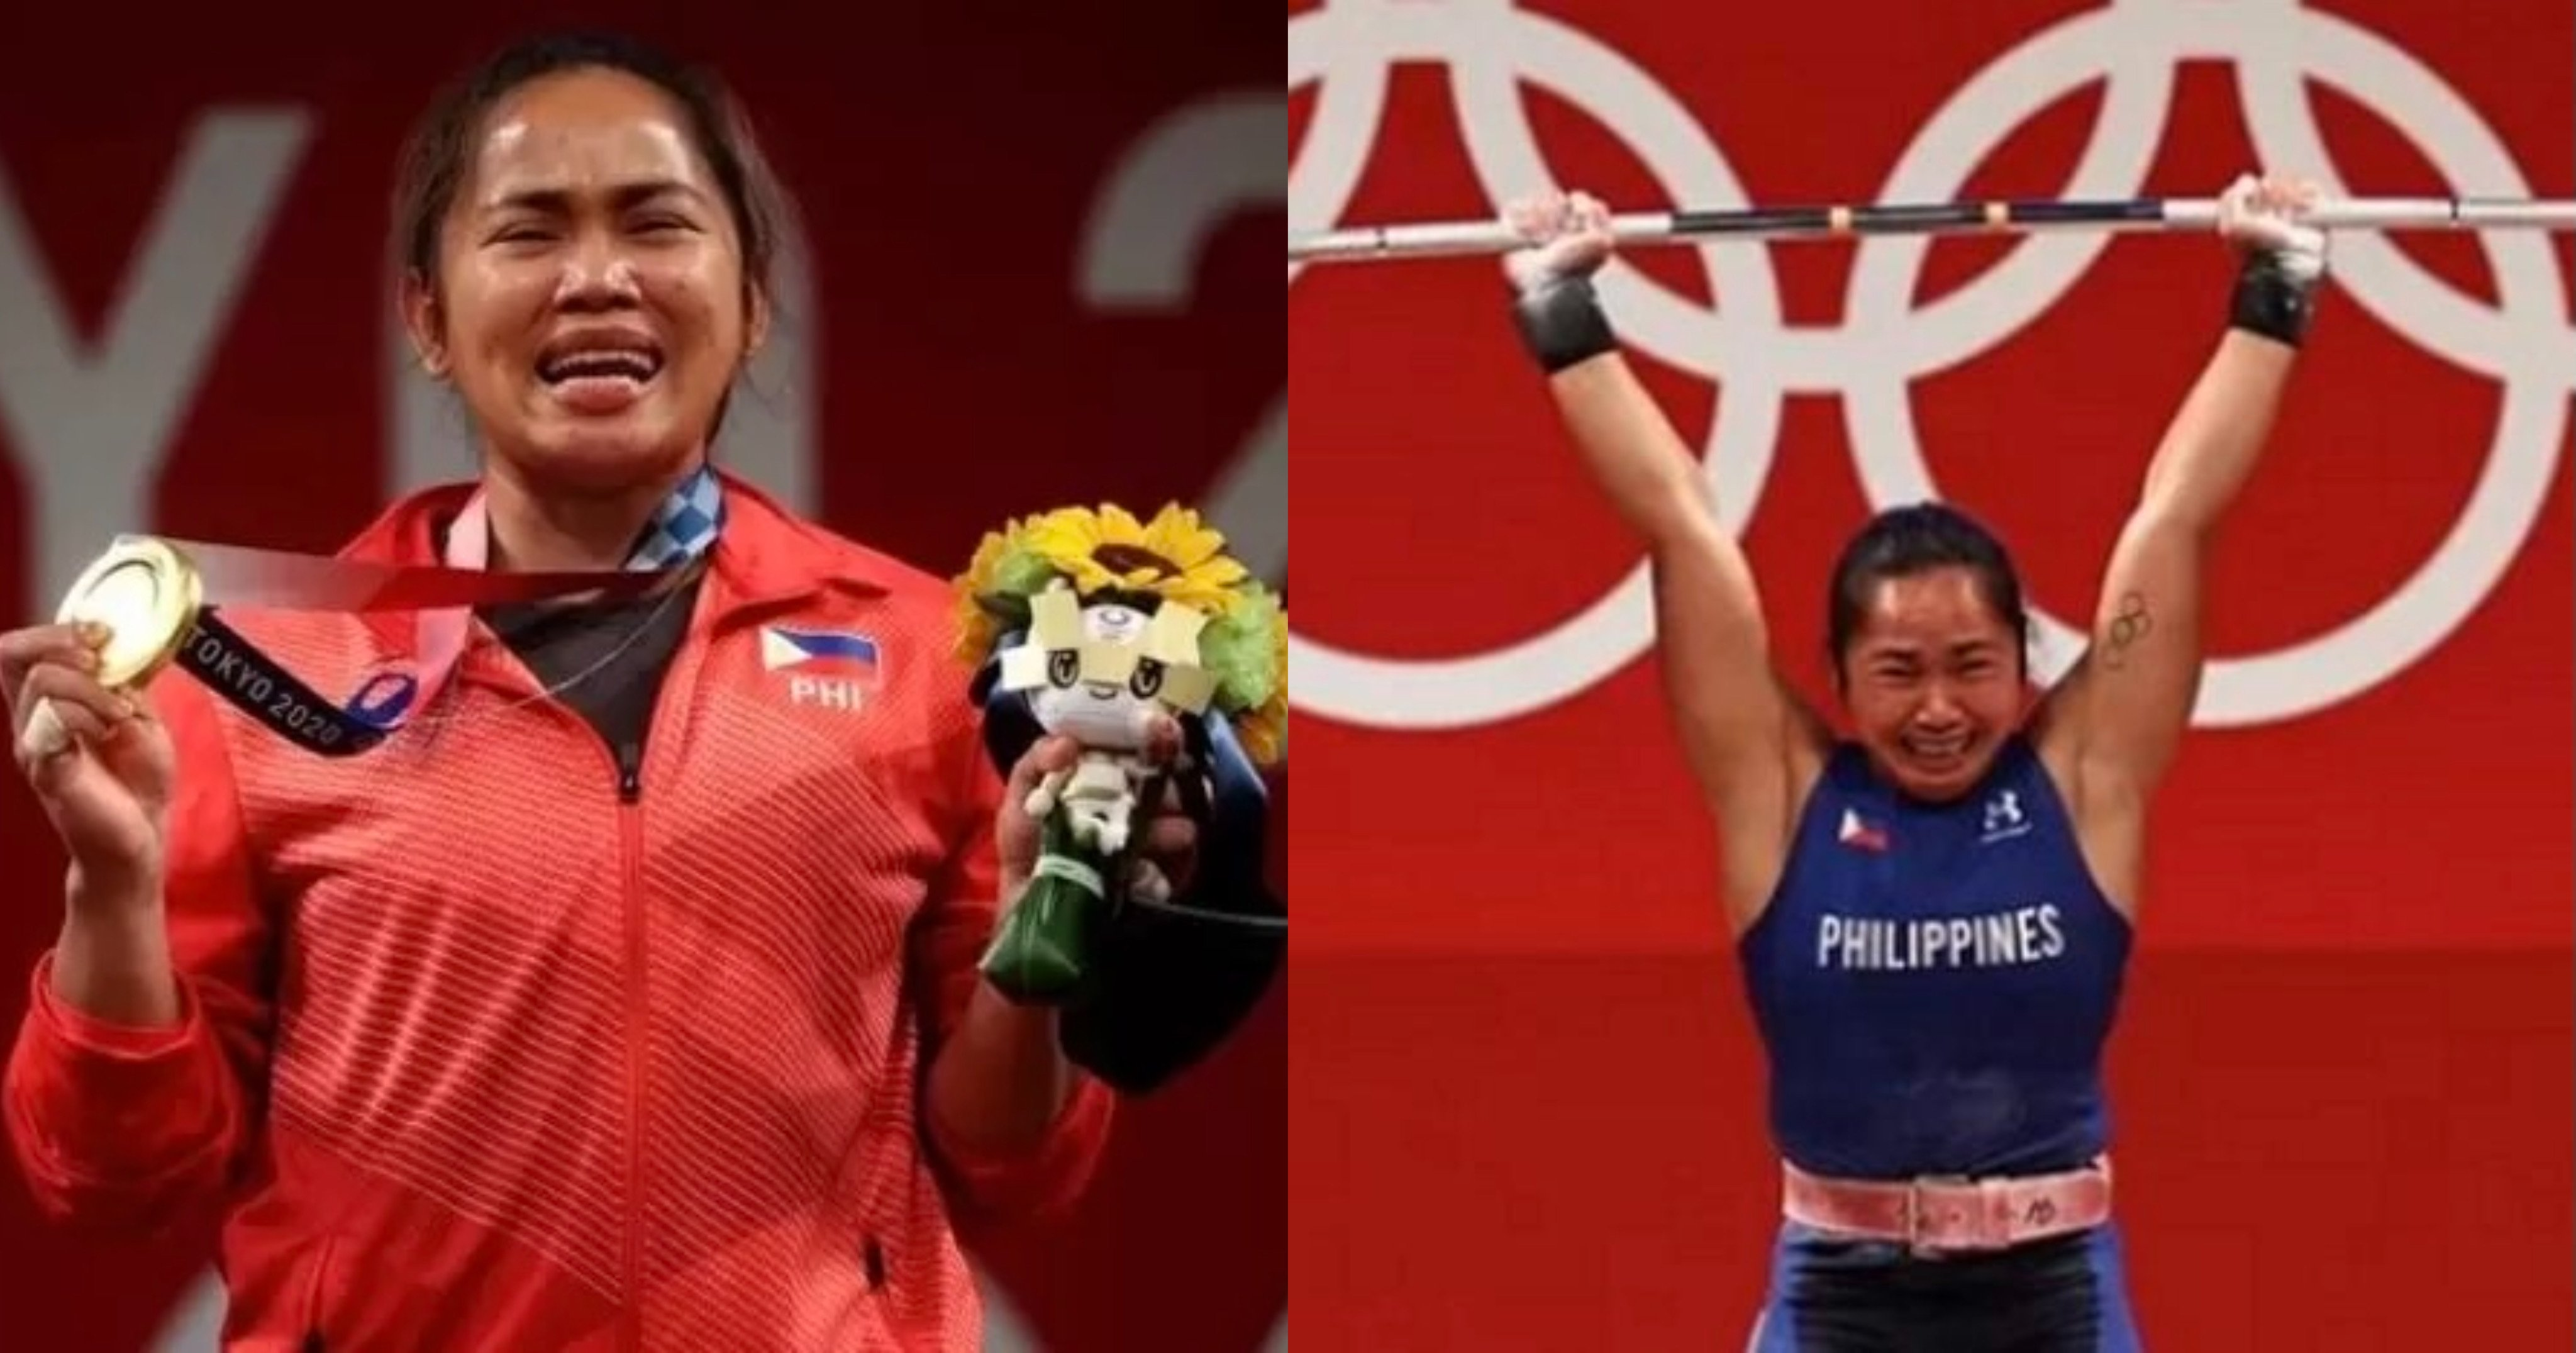 f5b476ed 29c4 4589 8c95 aefb0bd4aa74.jpeg?resize=412,232 - 사상 최초로 올림픽에서 첫 금메달 딴 필리핀 선수가 나라에서 받게 된다는 '선물+거액 포상금' 수준